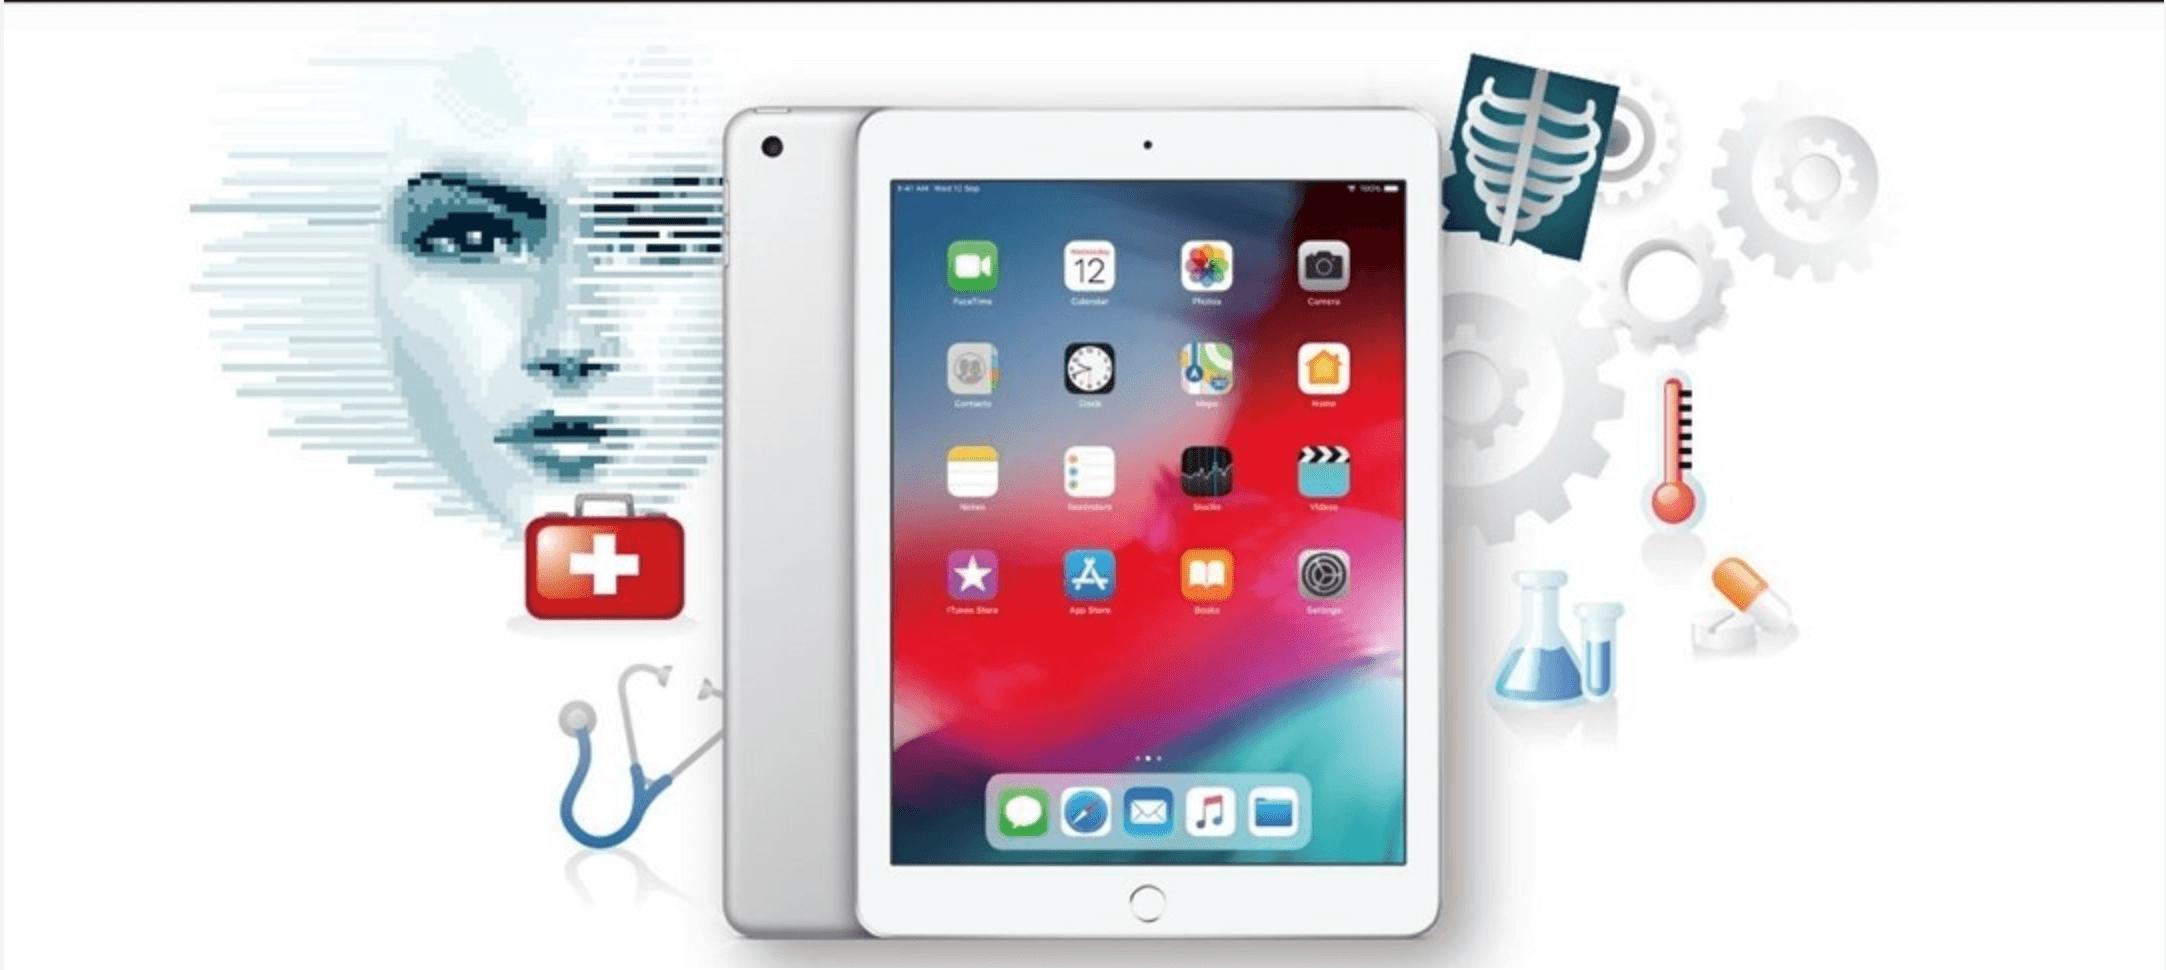 Apple 行動創新.企業智慧轉型與案例分享